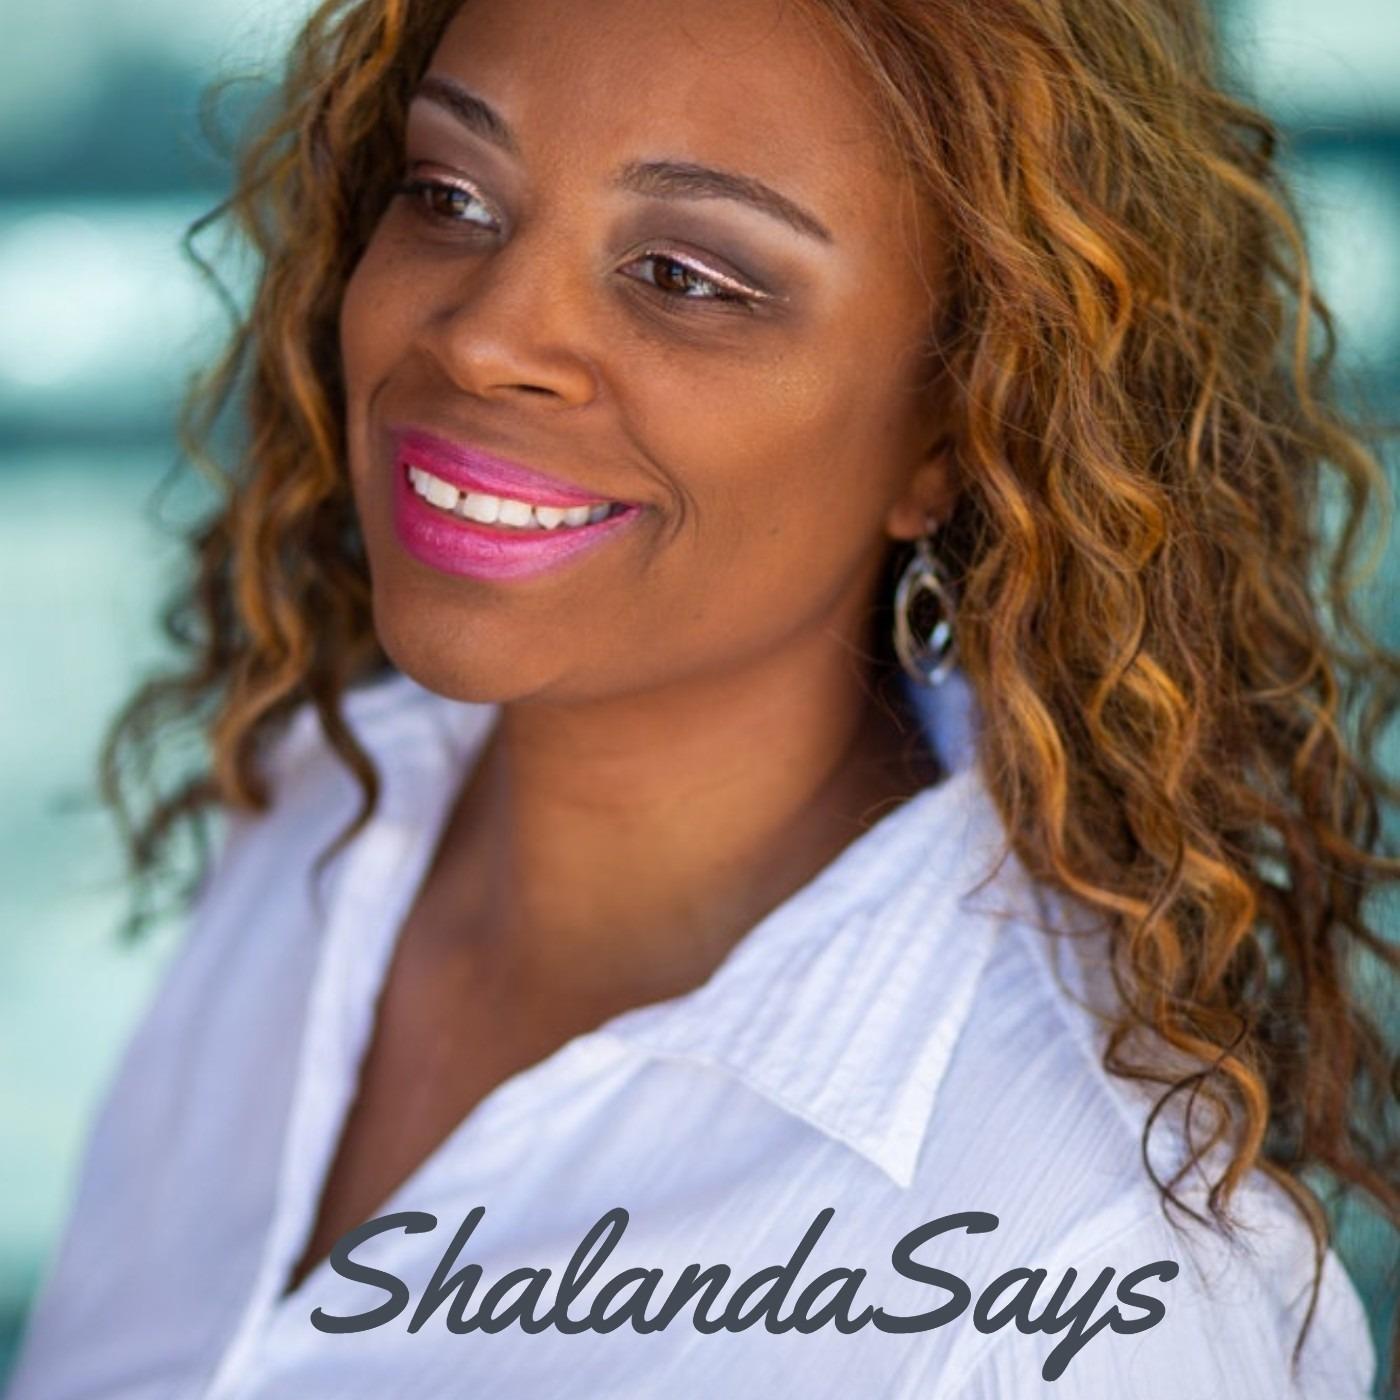 ShalandaSays Meet Career Expert Marc Miller Part 2 of 3